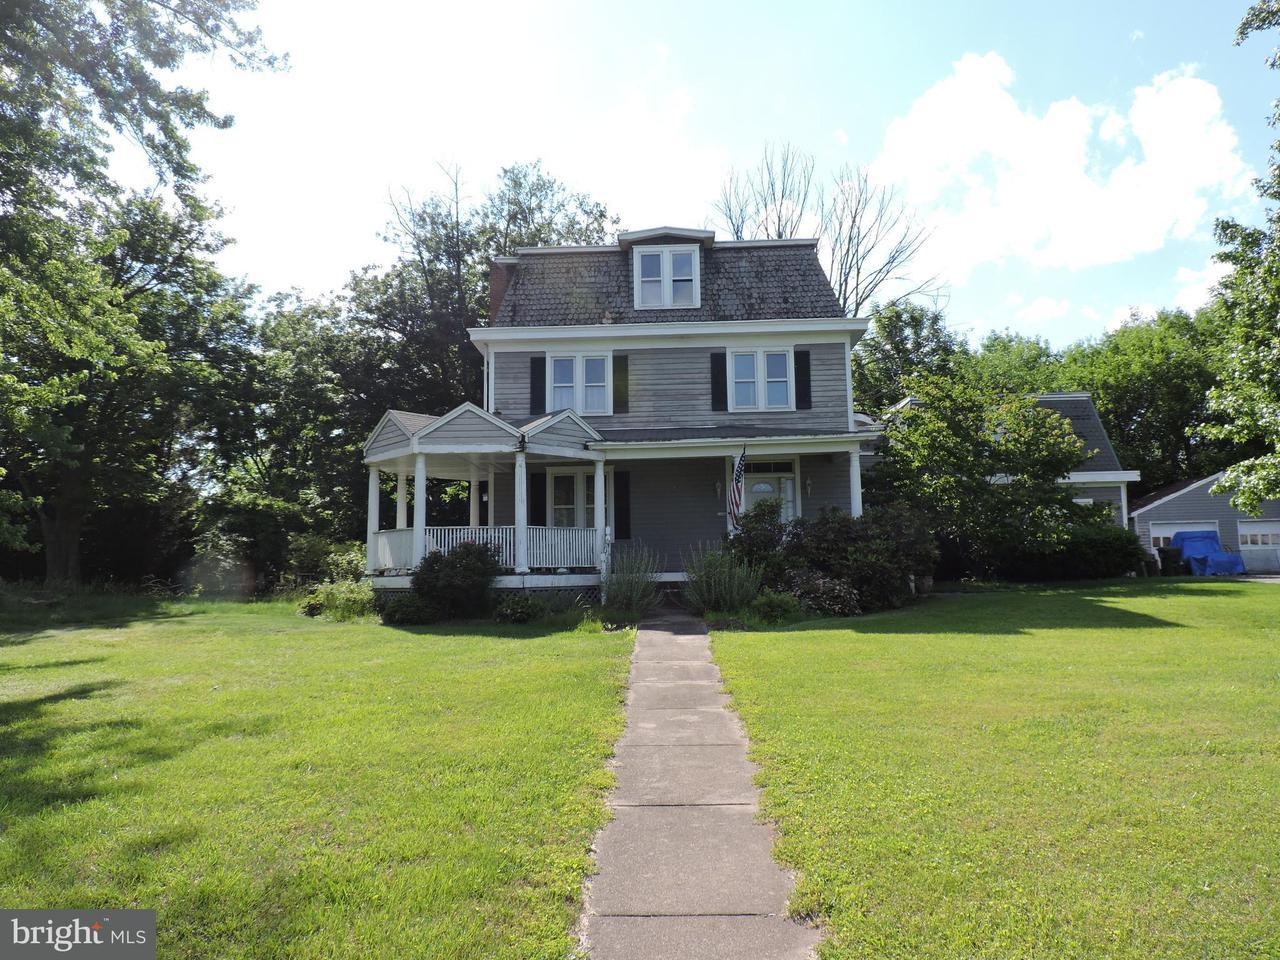 Land for Sale at 21819 Ashburn Road 21819 Ashburn Road Ashburn, Virginia 20147 United States